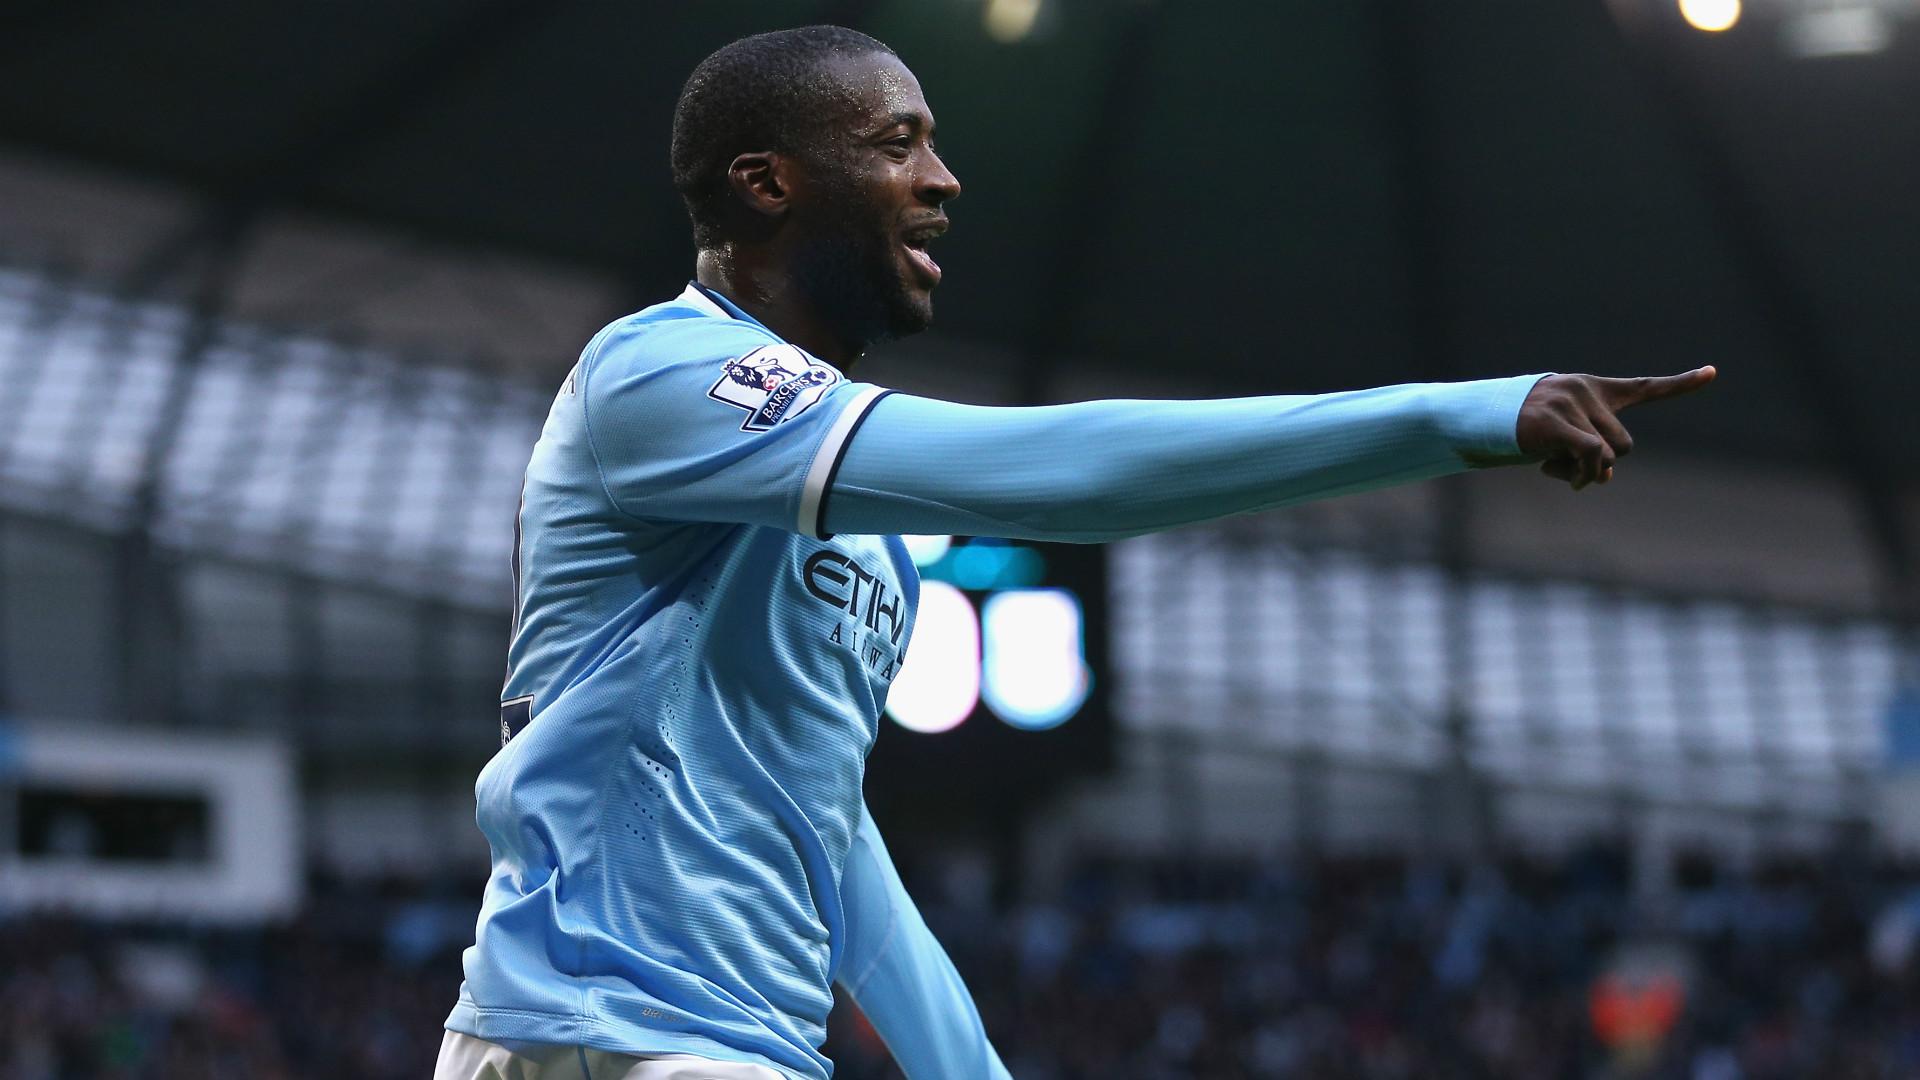 Yaya Toure Manchester City 2013-14